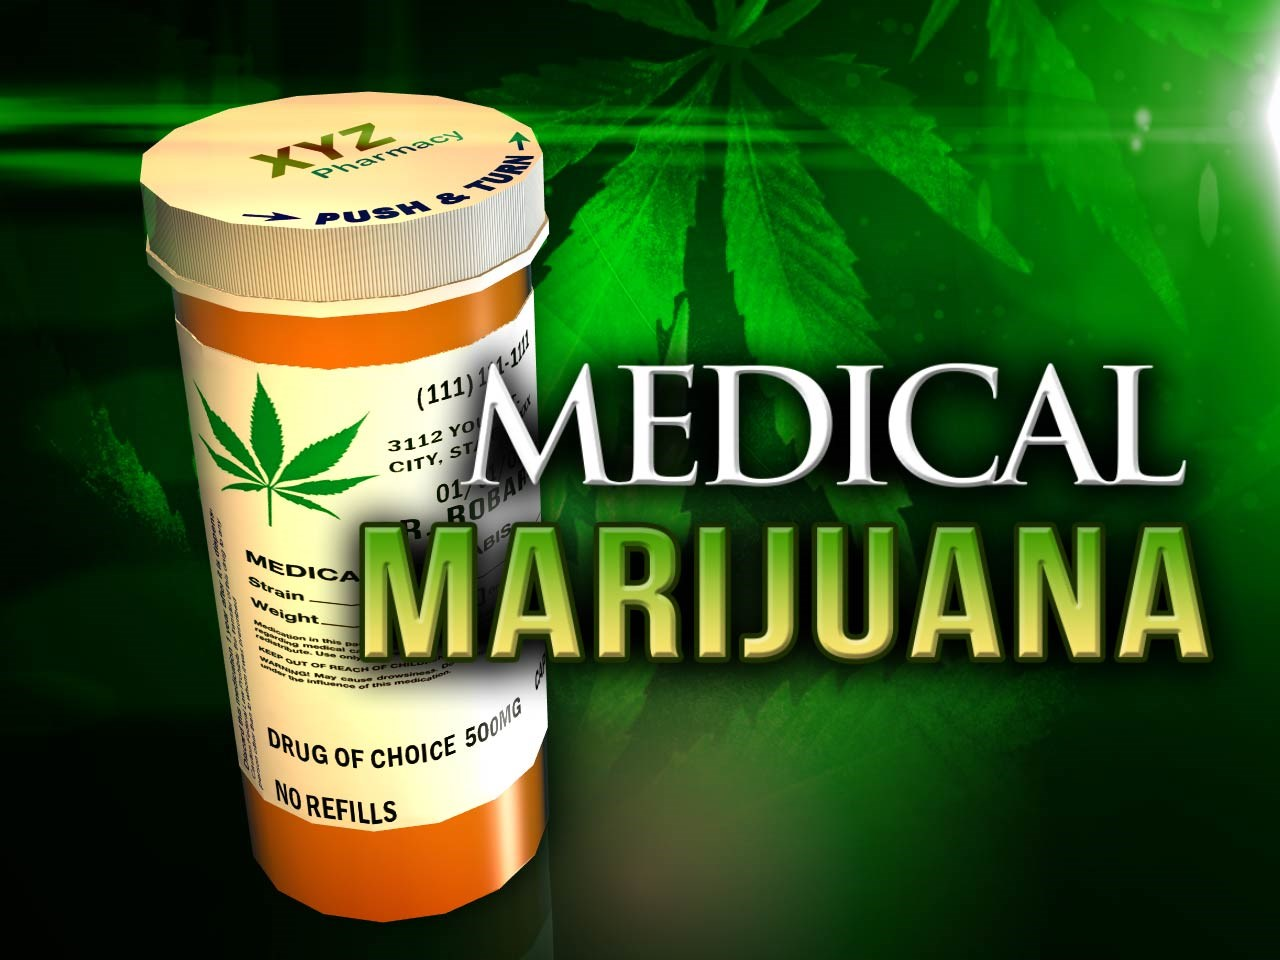 Medical Marijuana 2_1556908820584.jpg-118809306.jpg